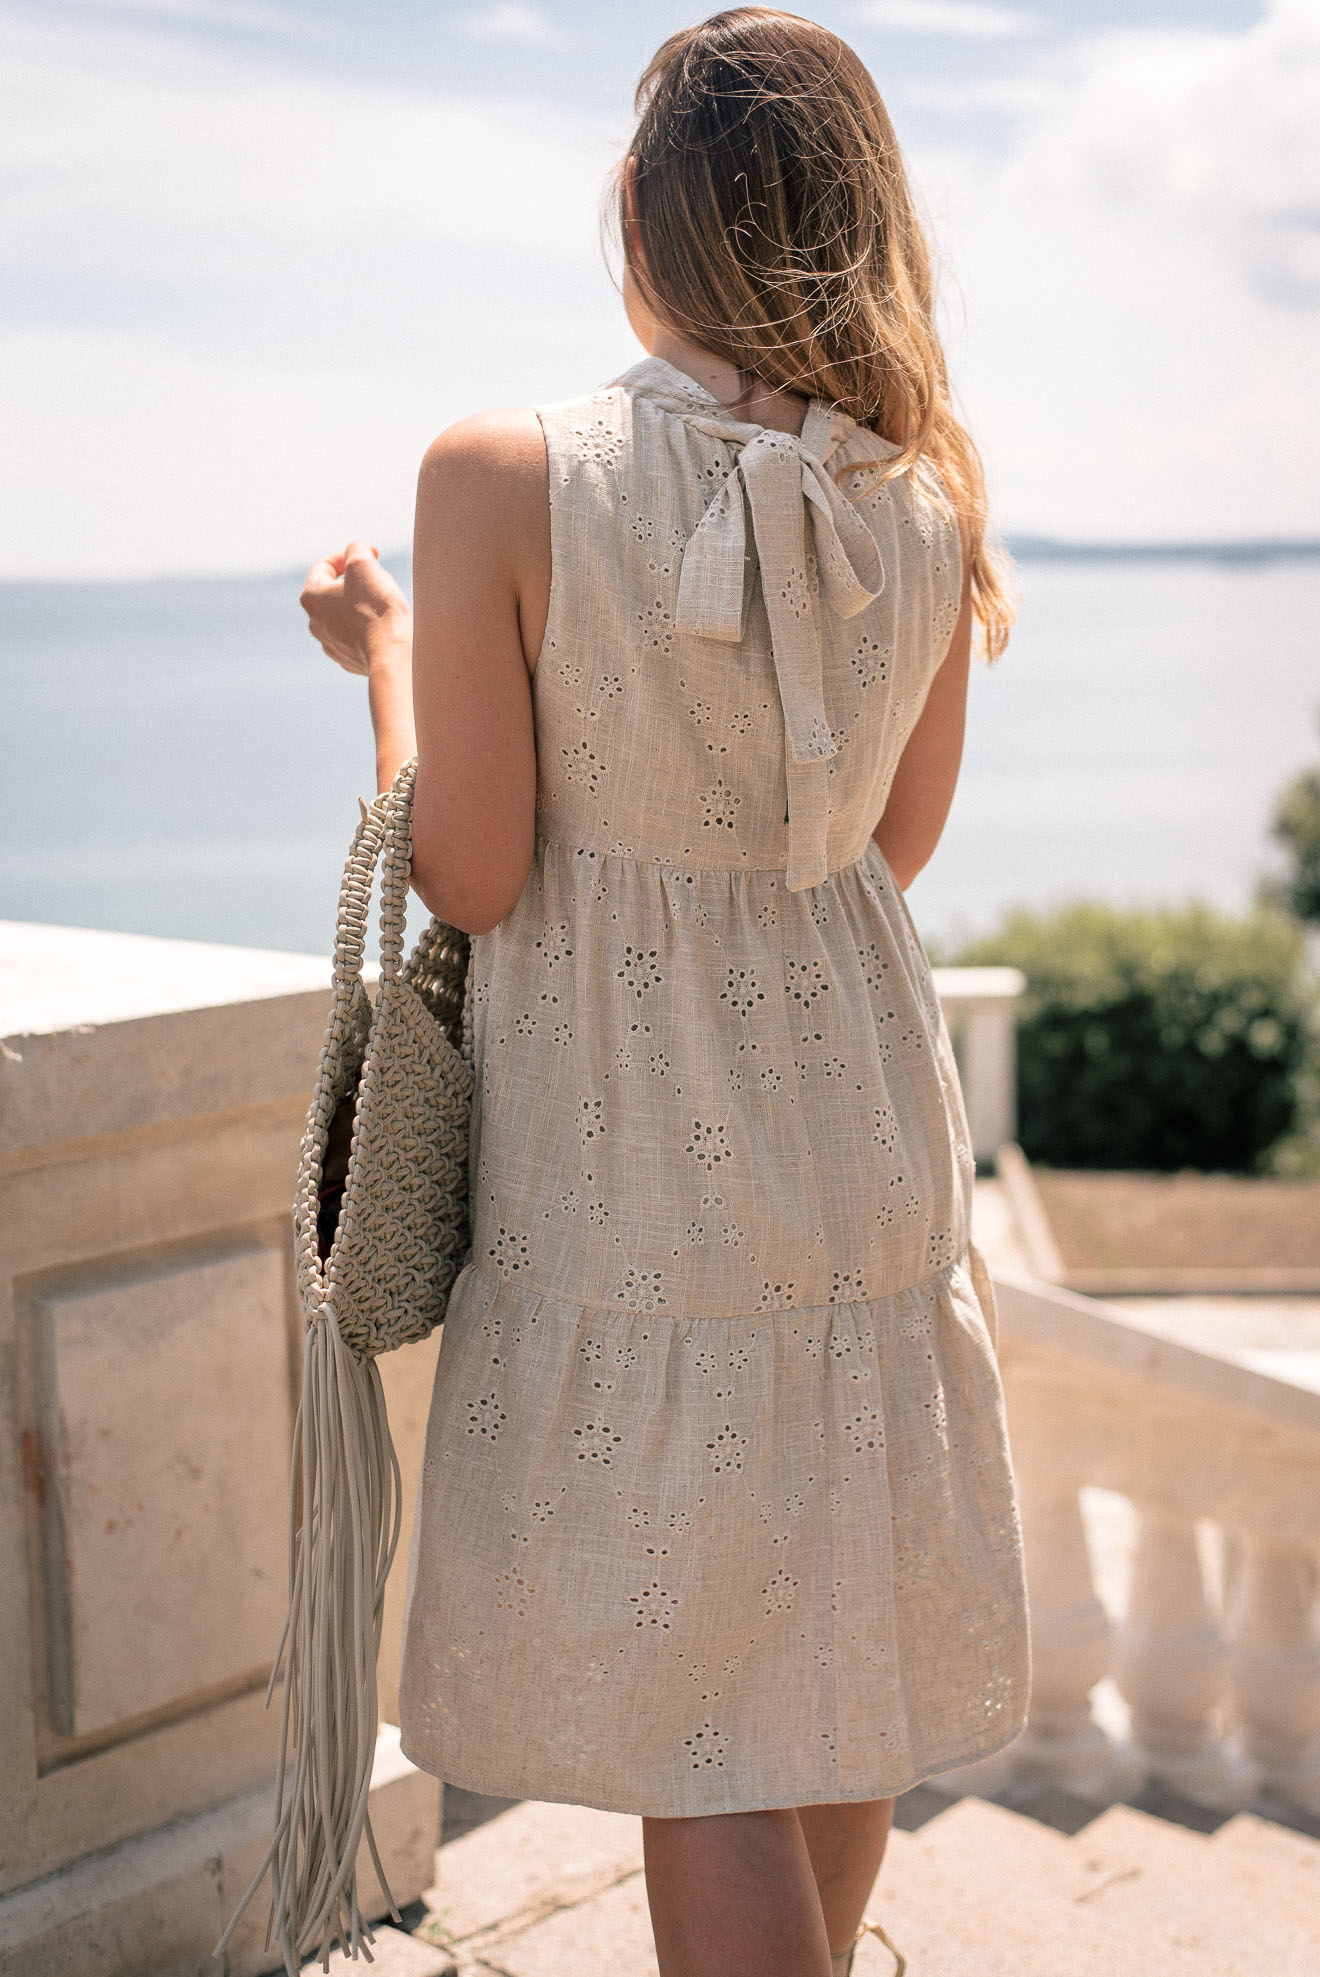 wearing my Denina Martin Collection dress